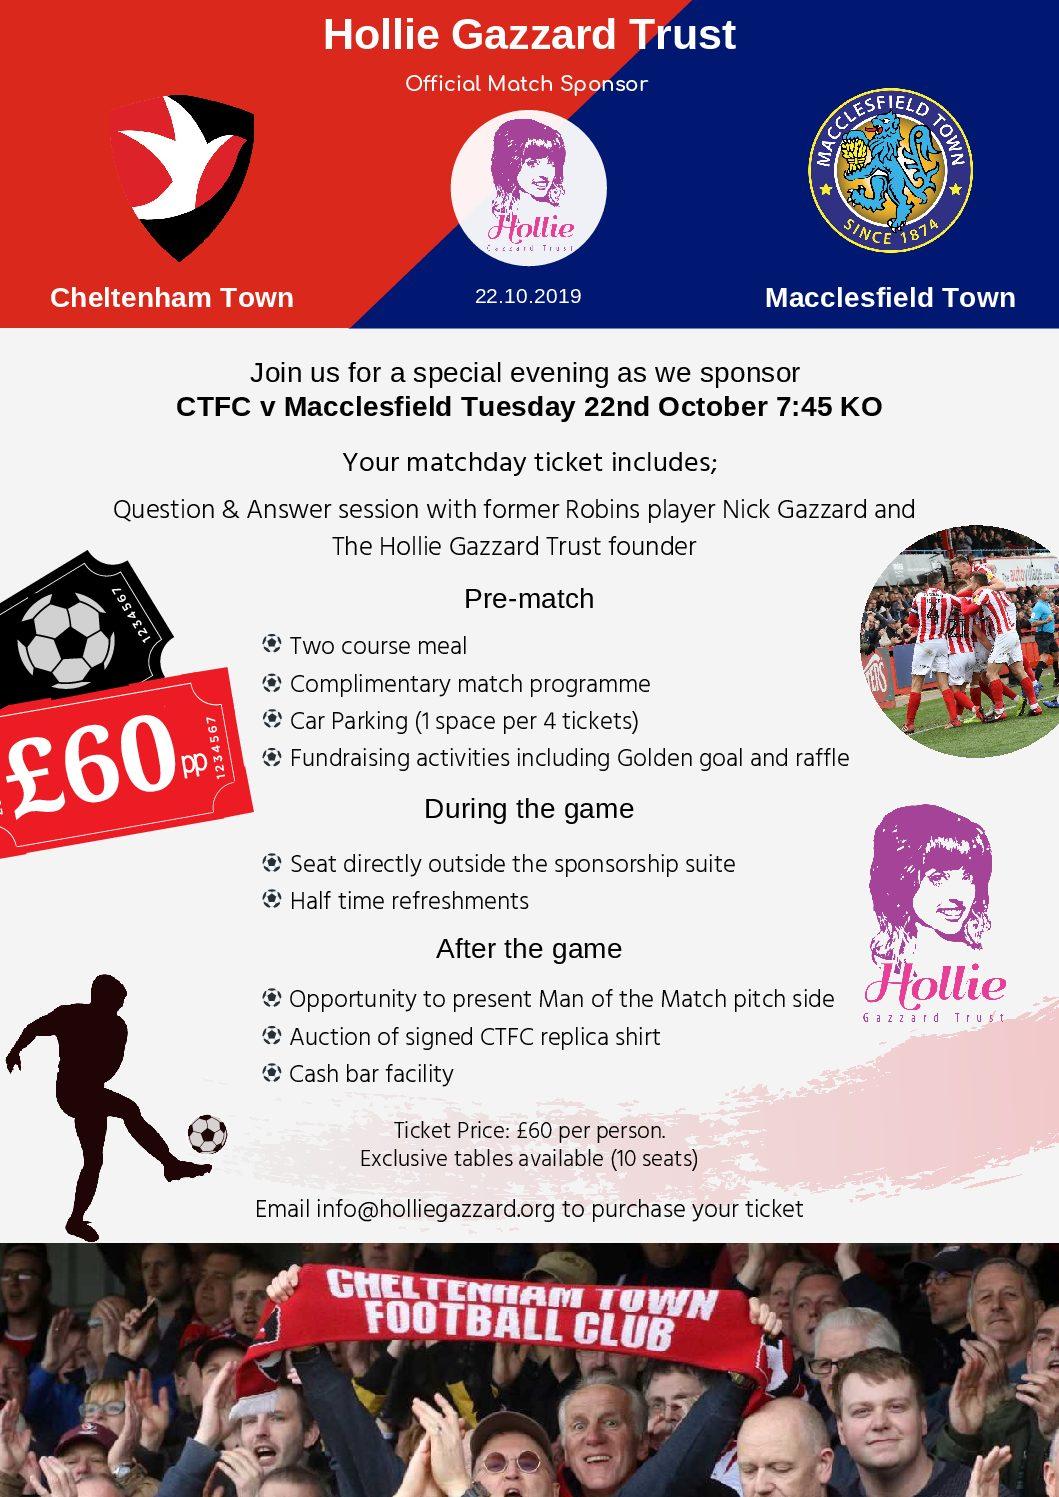 CTFC V Macclesfield